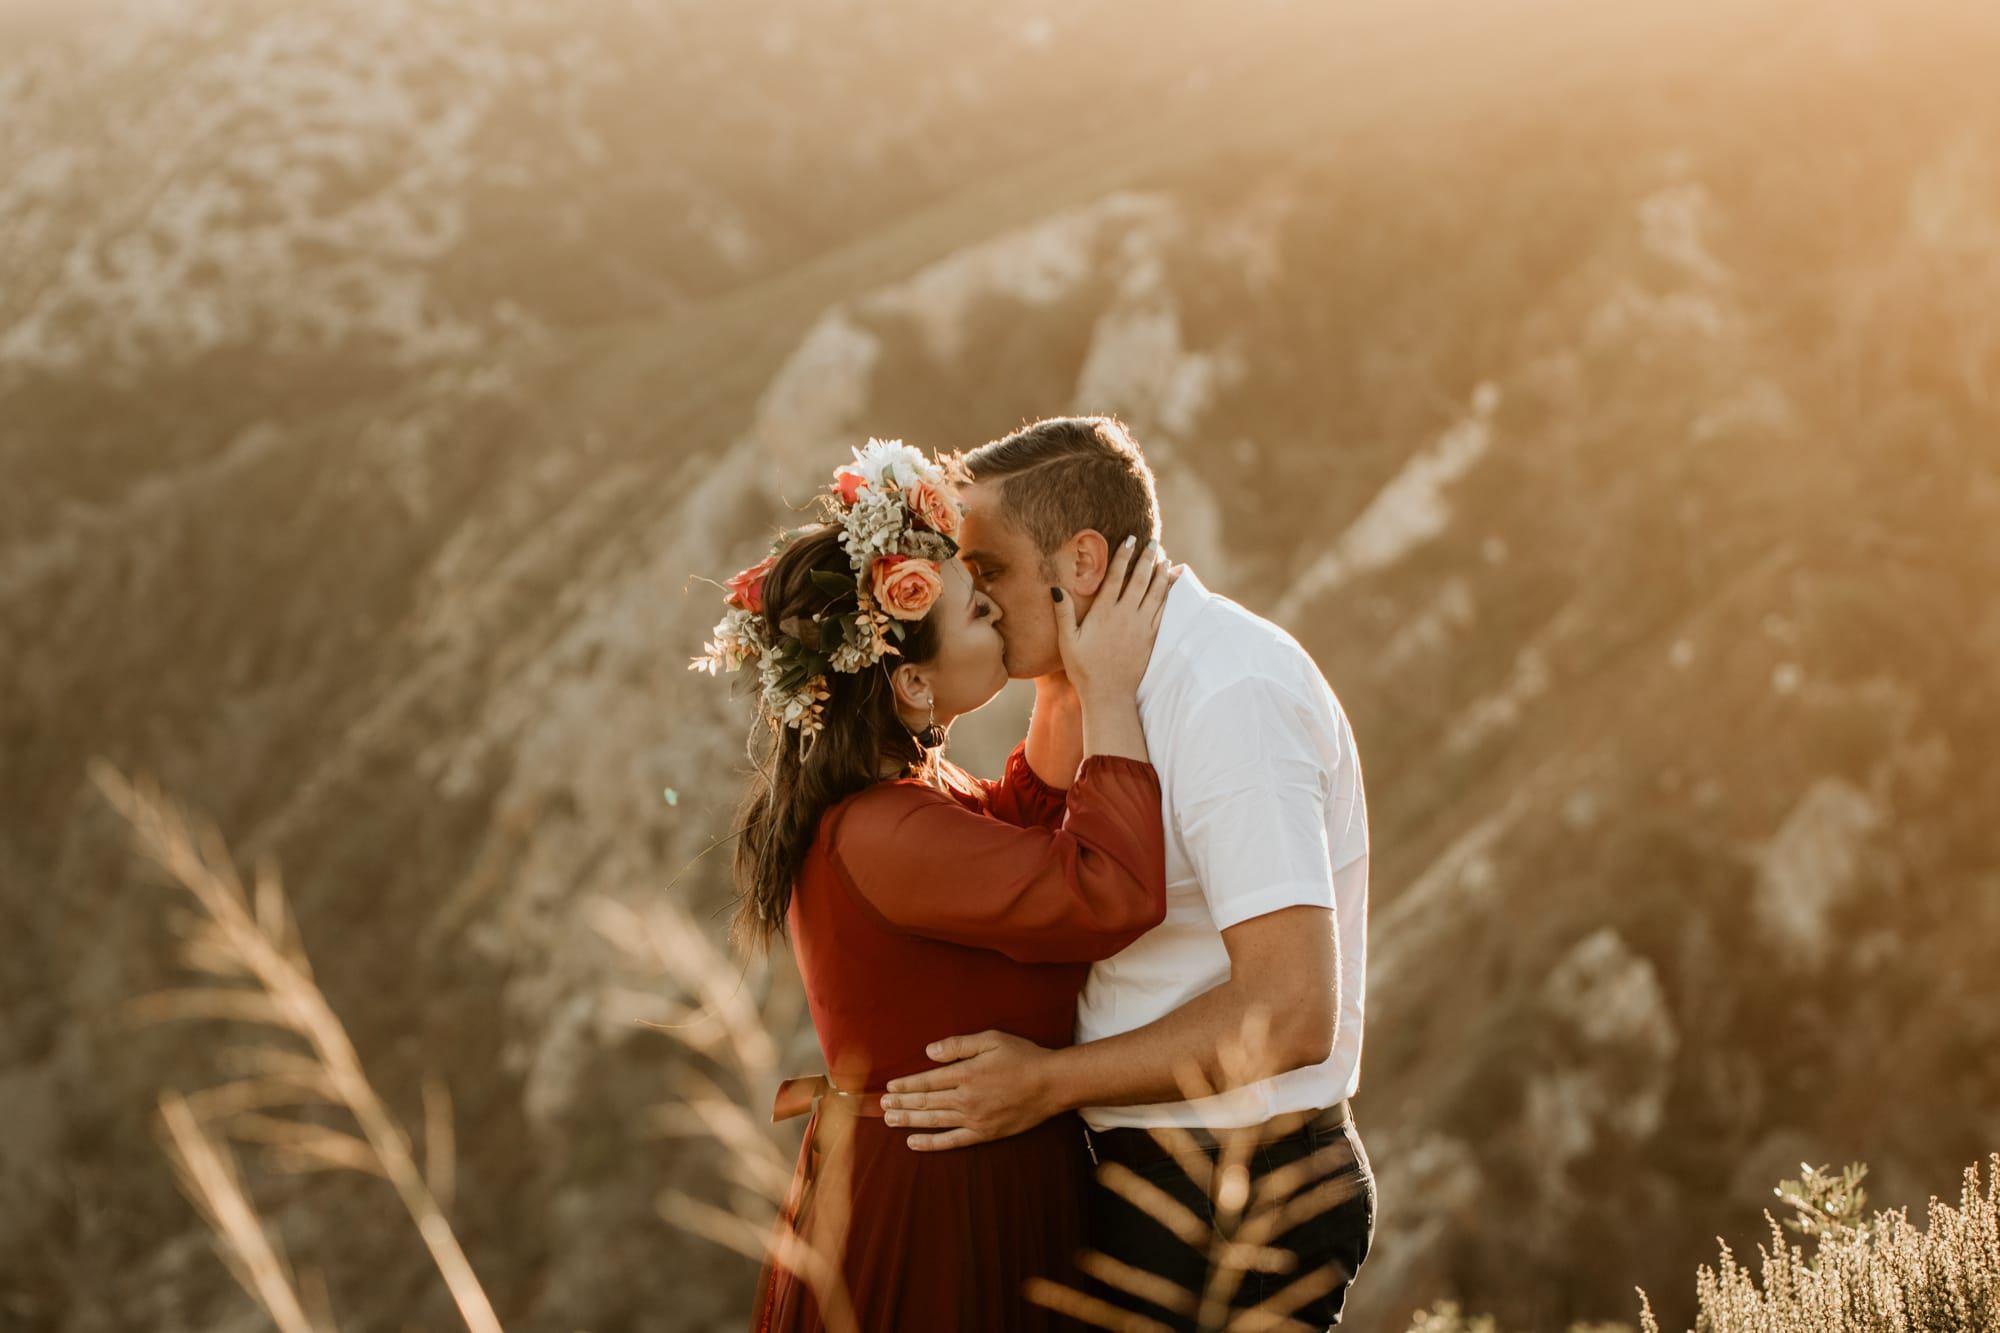 jesann-freddie-kranshoek-engagement-June-Richards-Photography-Destination-Weddings-Elopements-Garden-Route-58